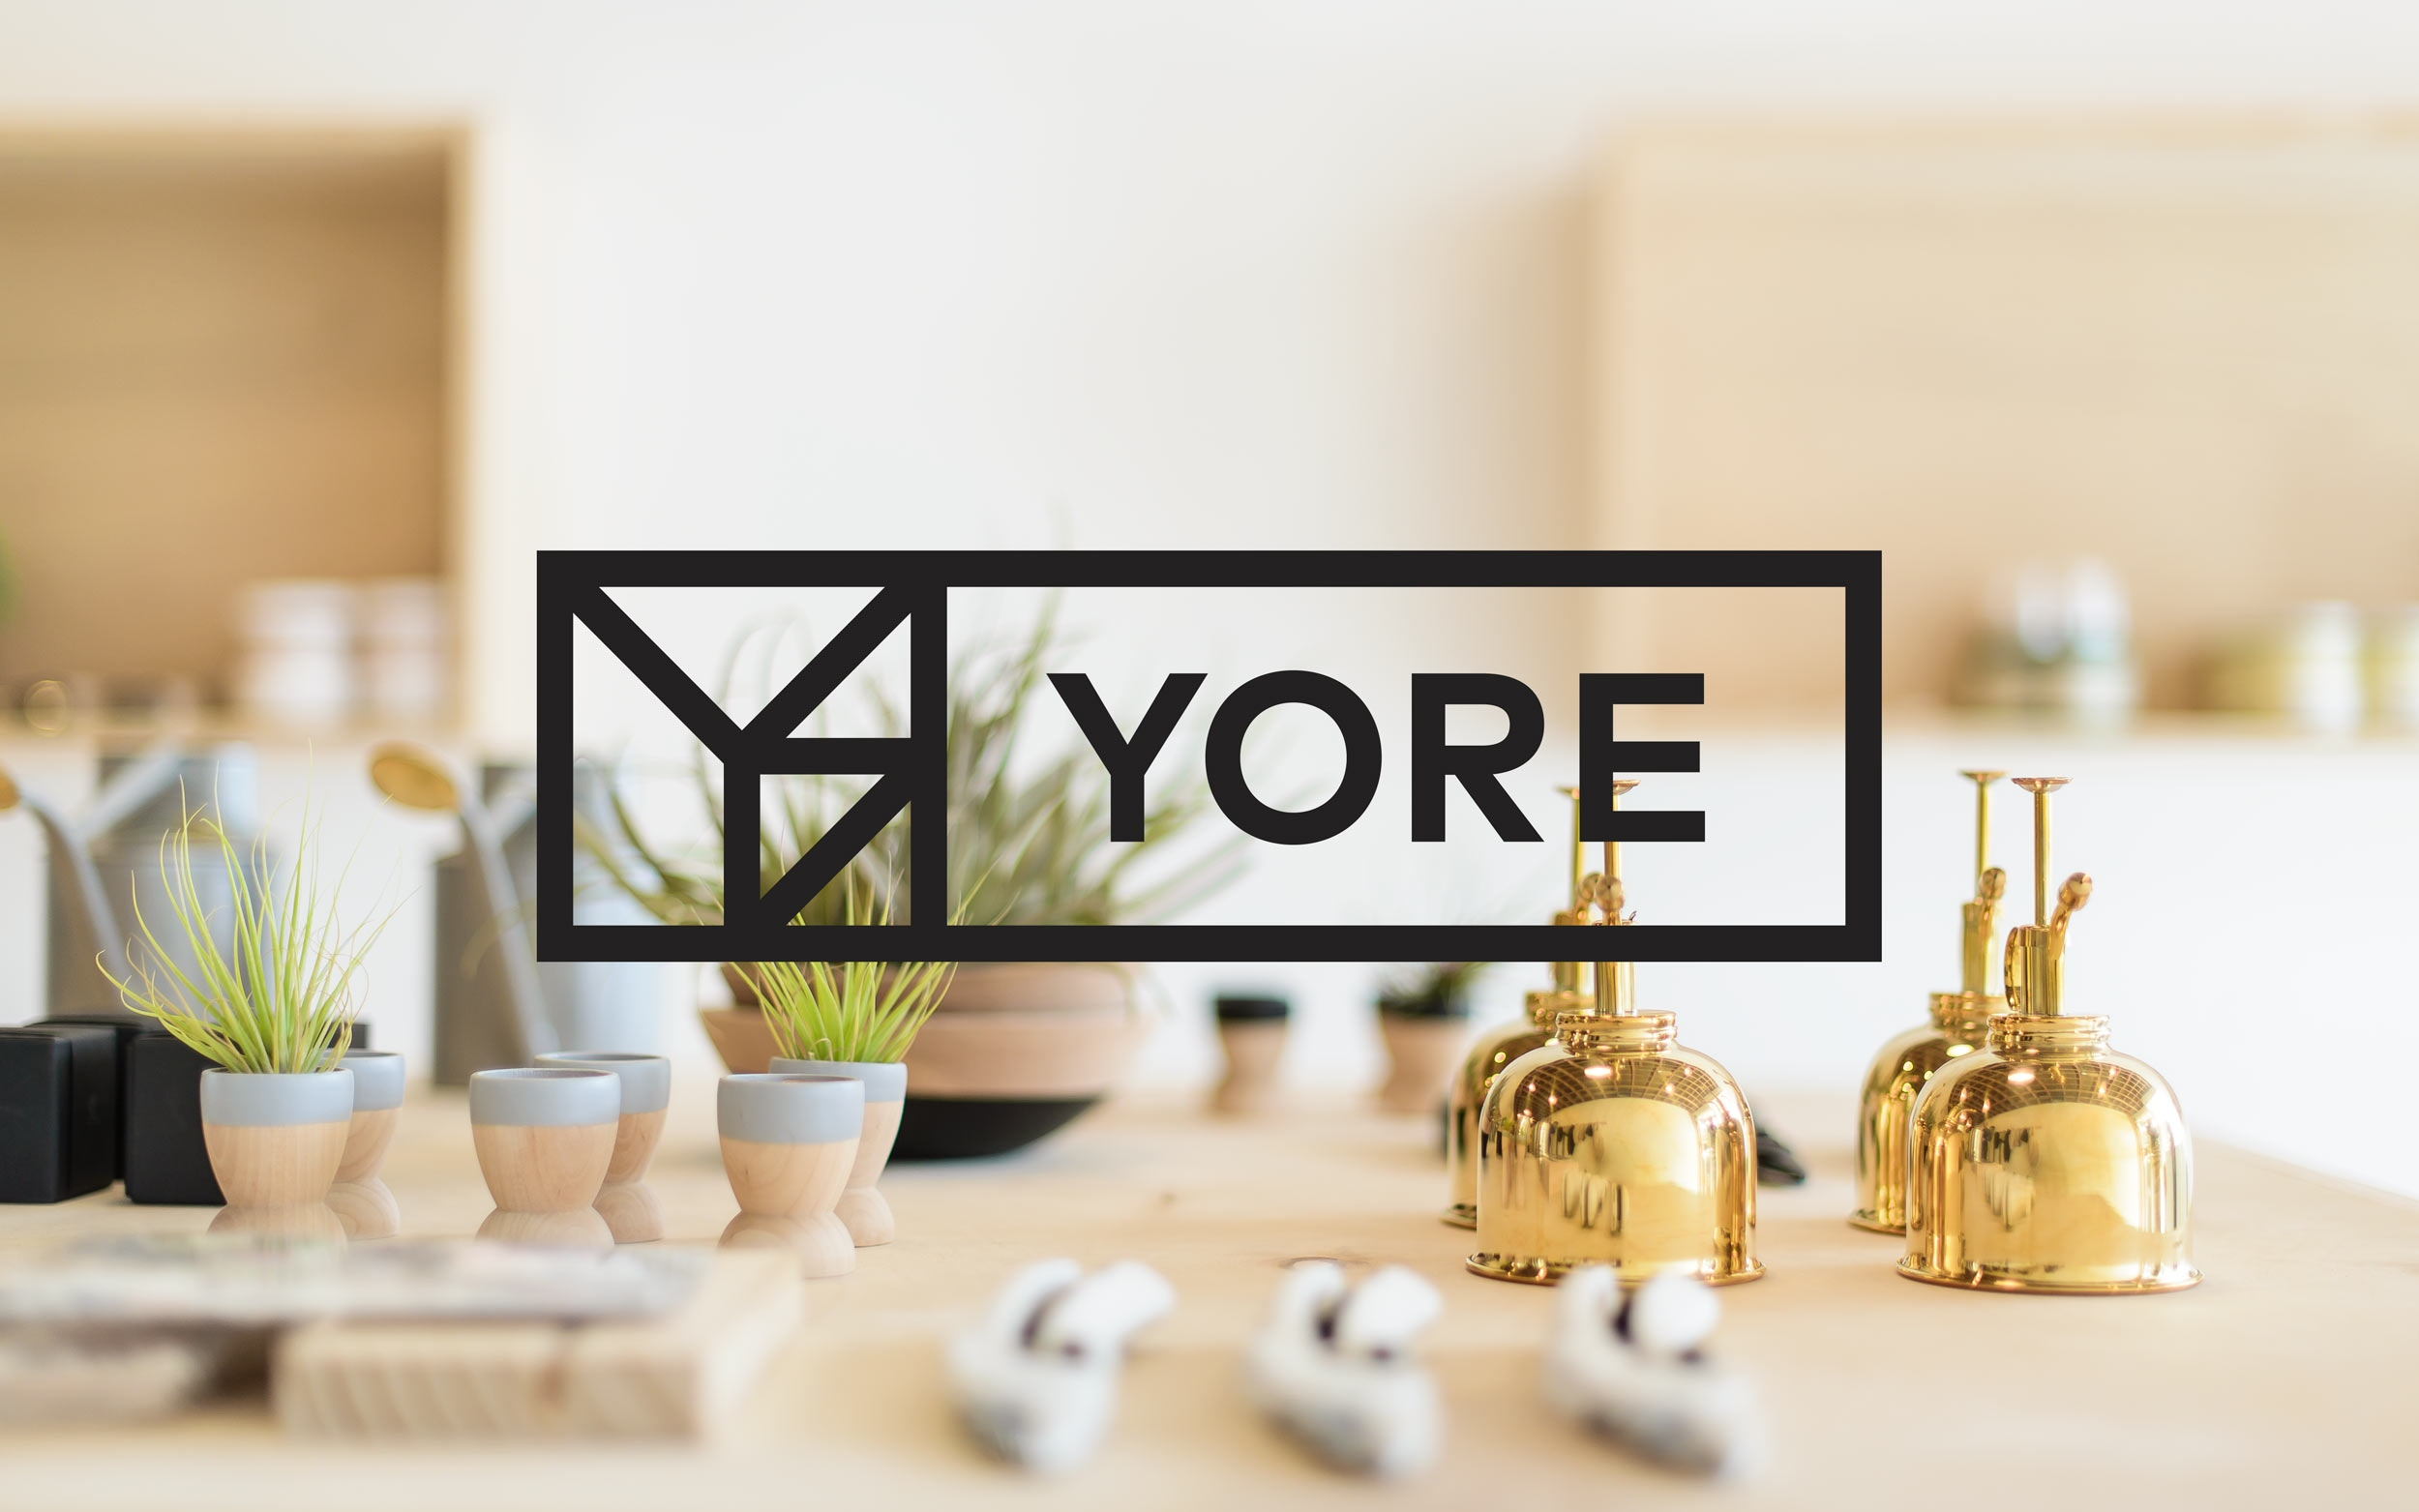 yore-cast-iron-design-logo.jpg